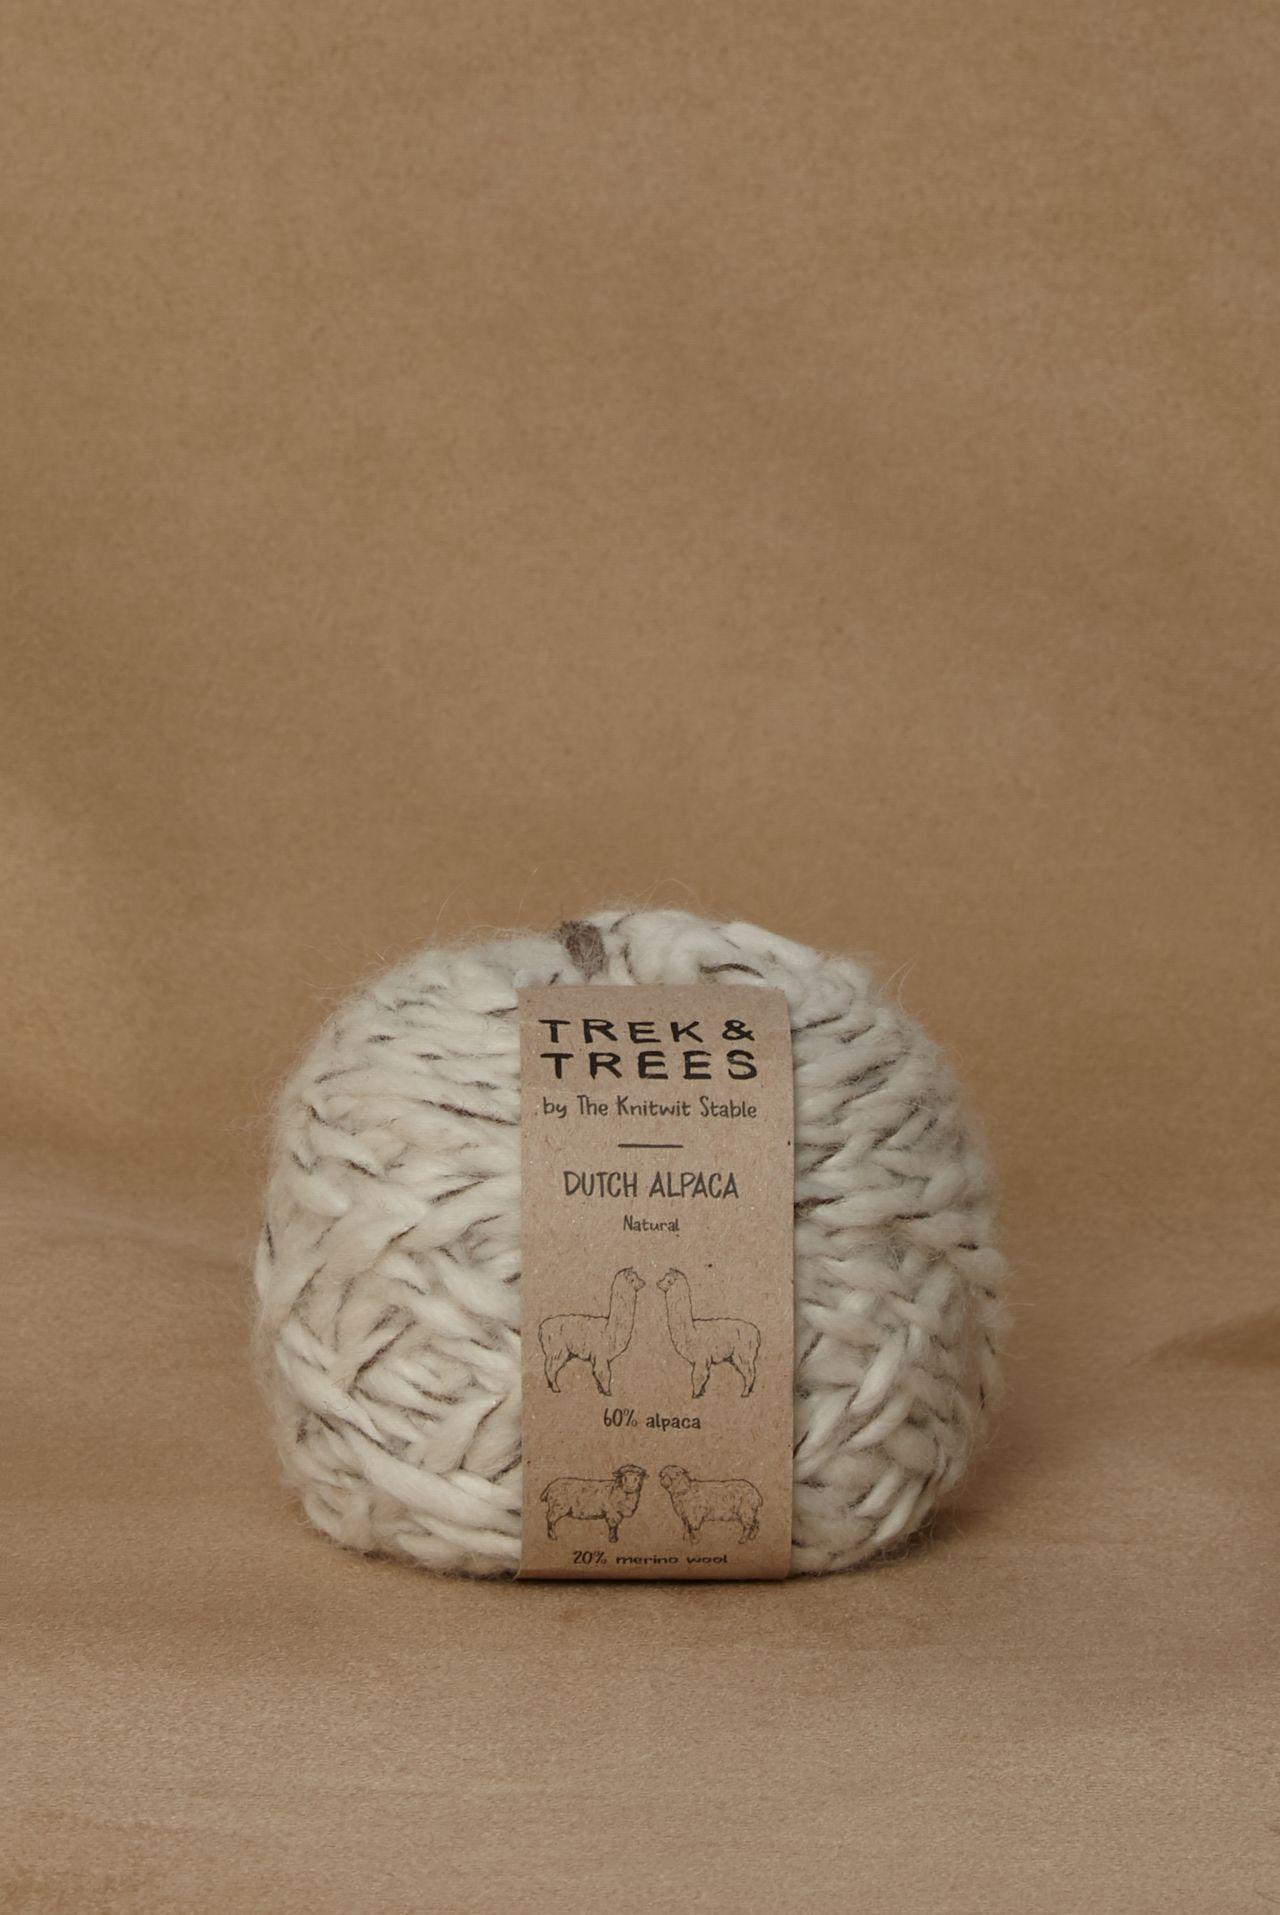 Dutch alpaca wol packshot.